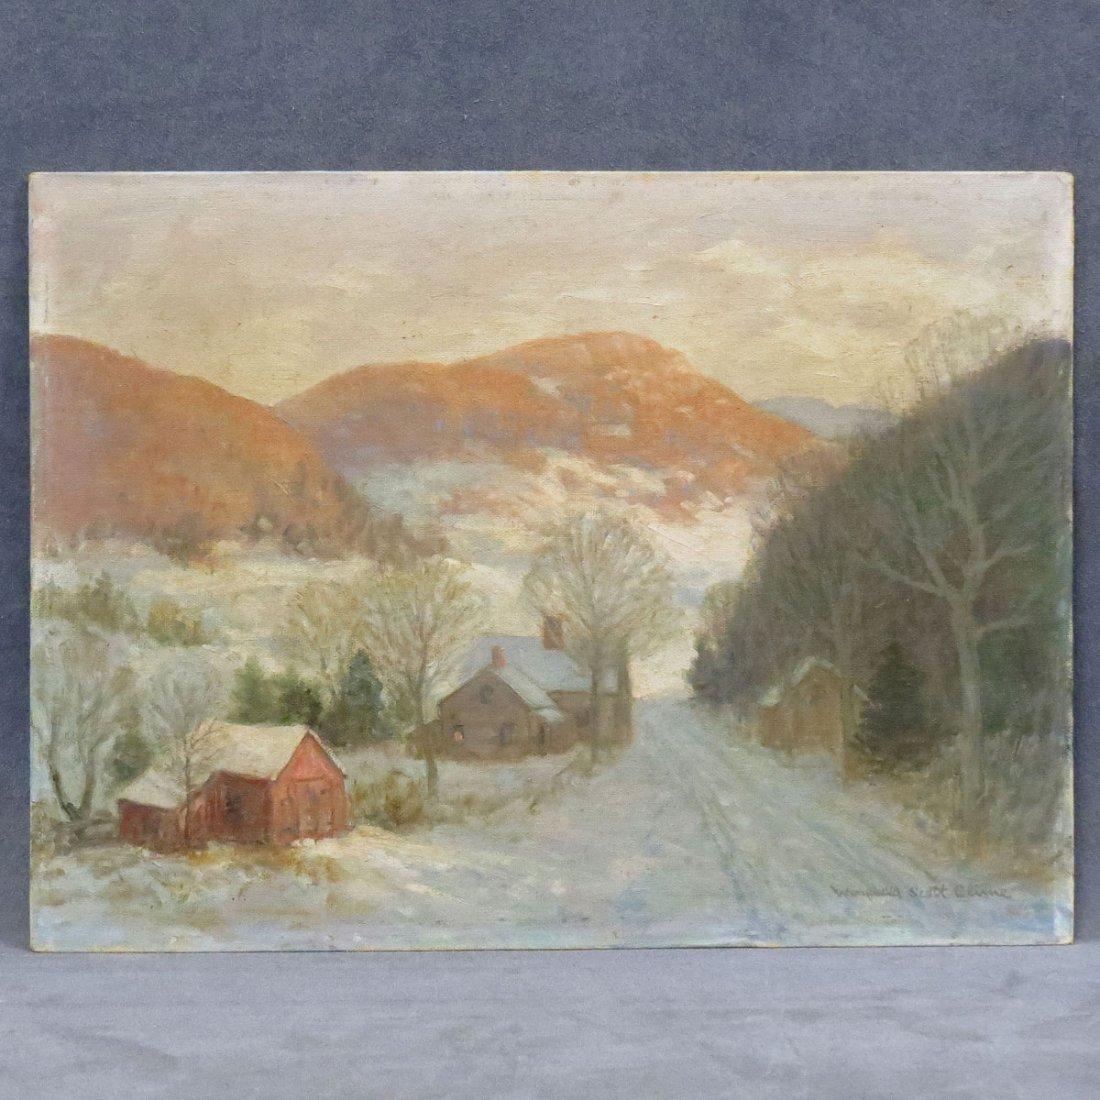 WINFIELD SCOTT CLIME (AMERICAN 1881-1958), OIL